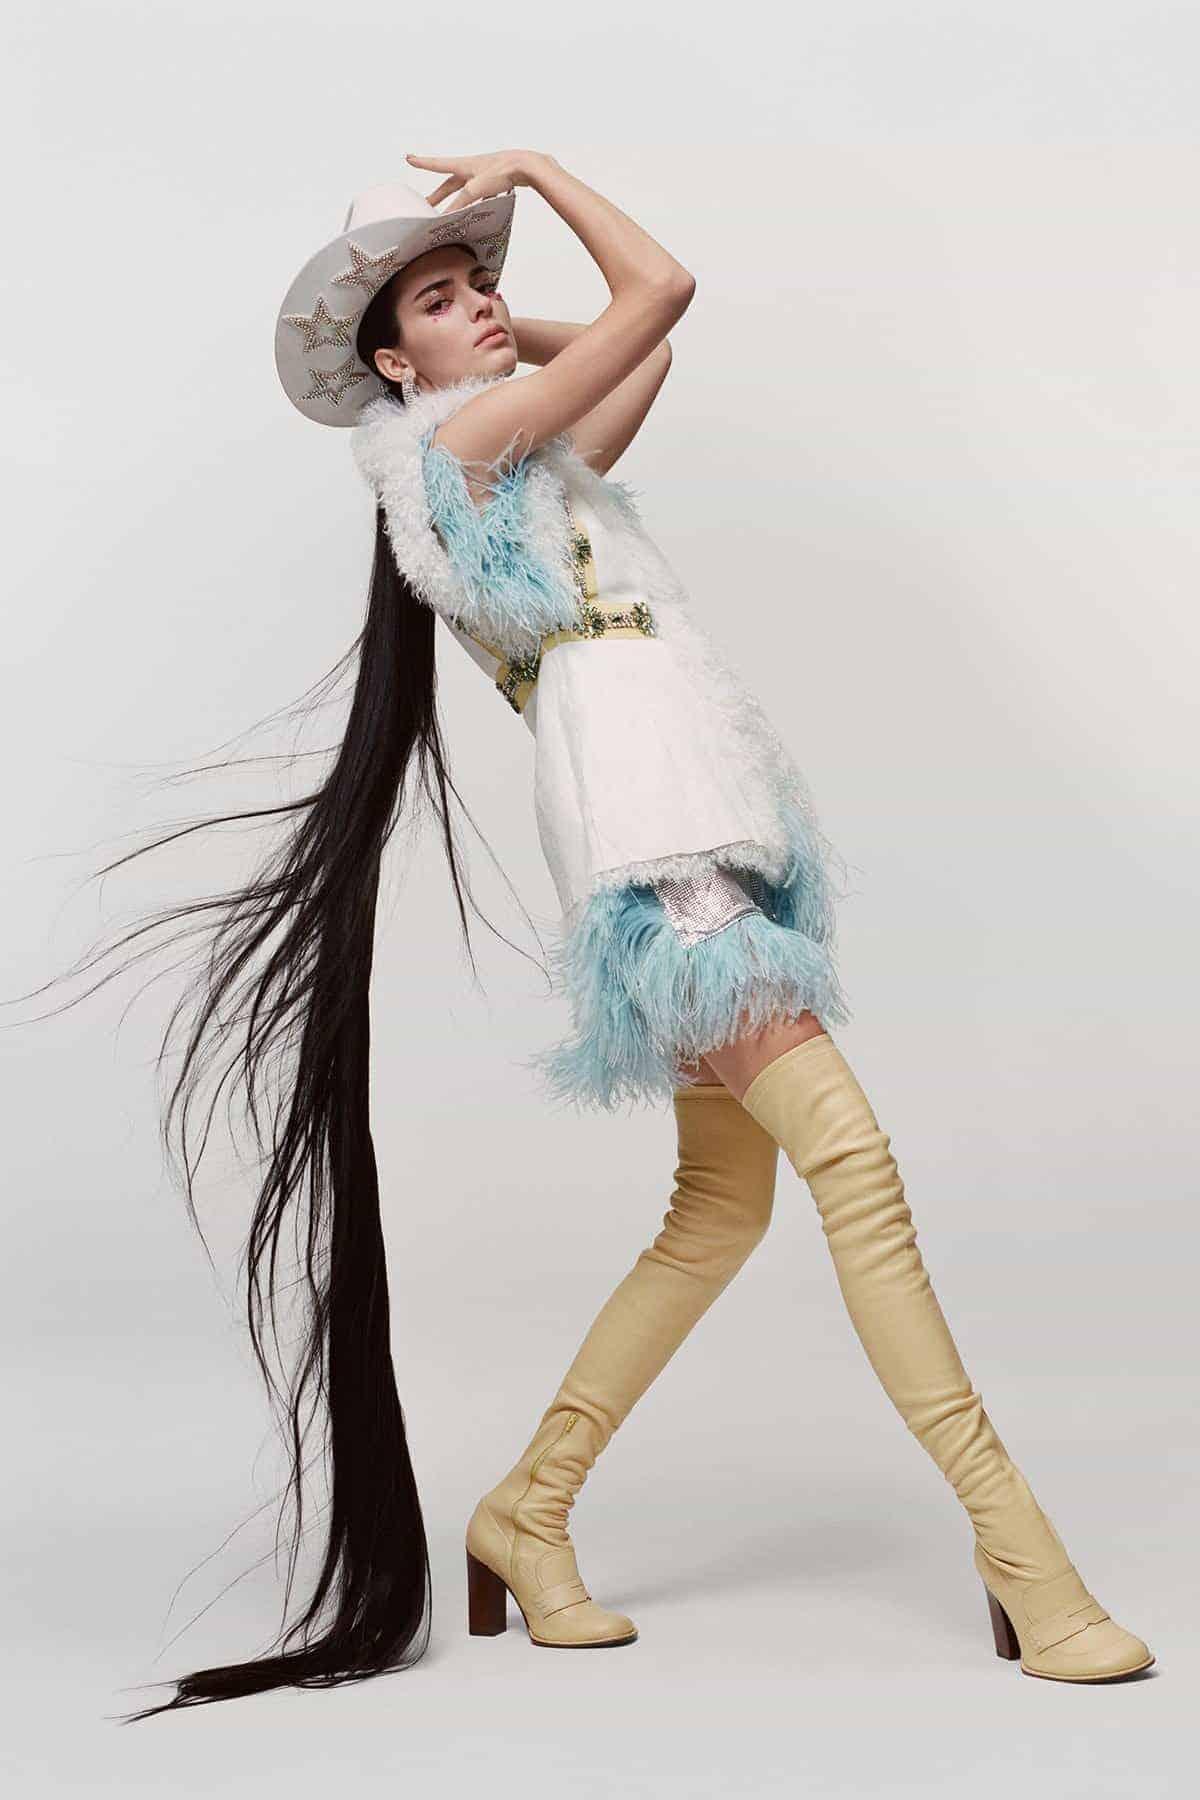 Maurizio Cattelan fotografeert Kendall Jenner